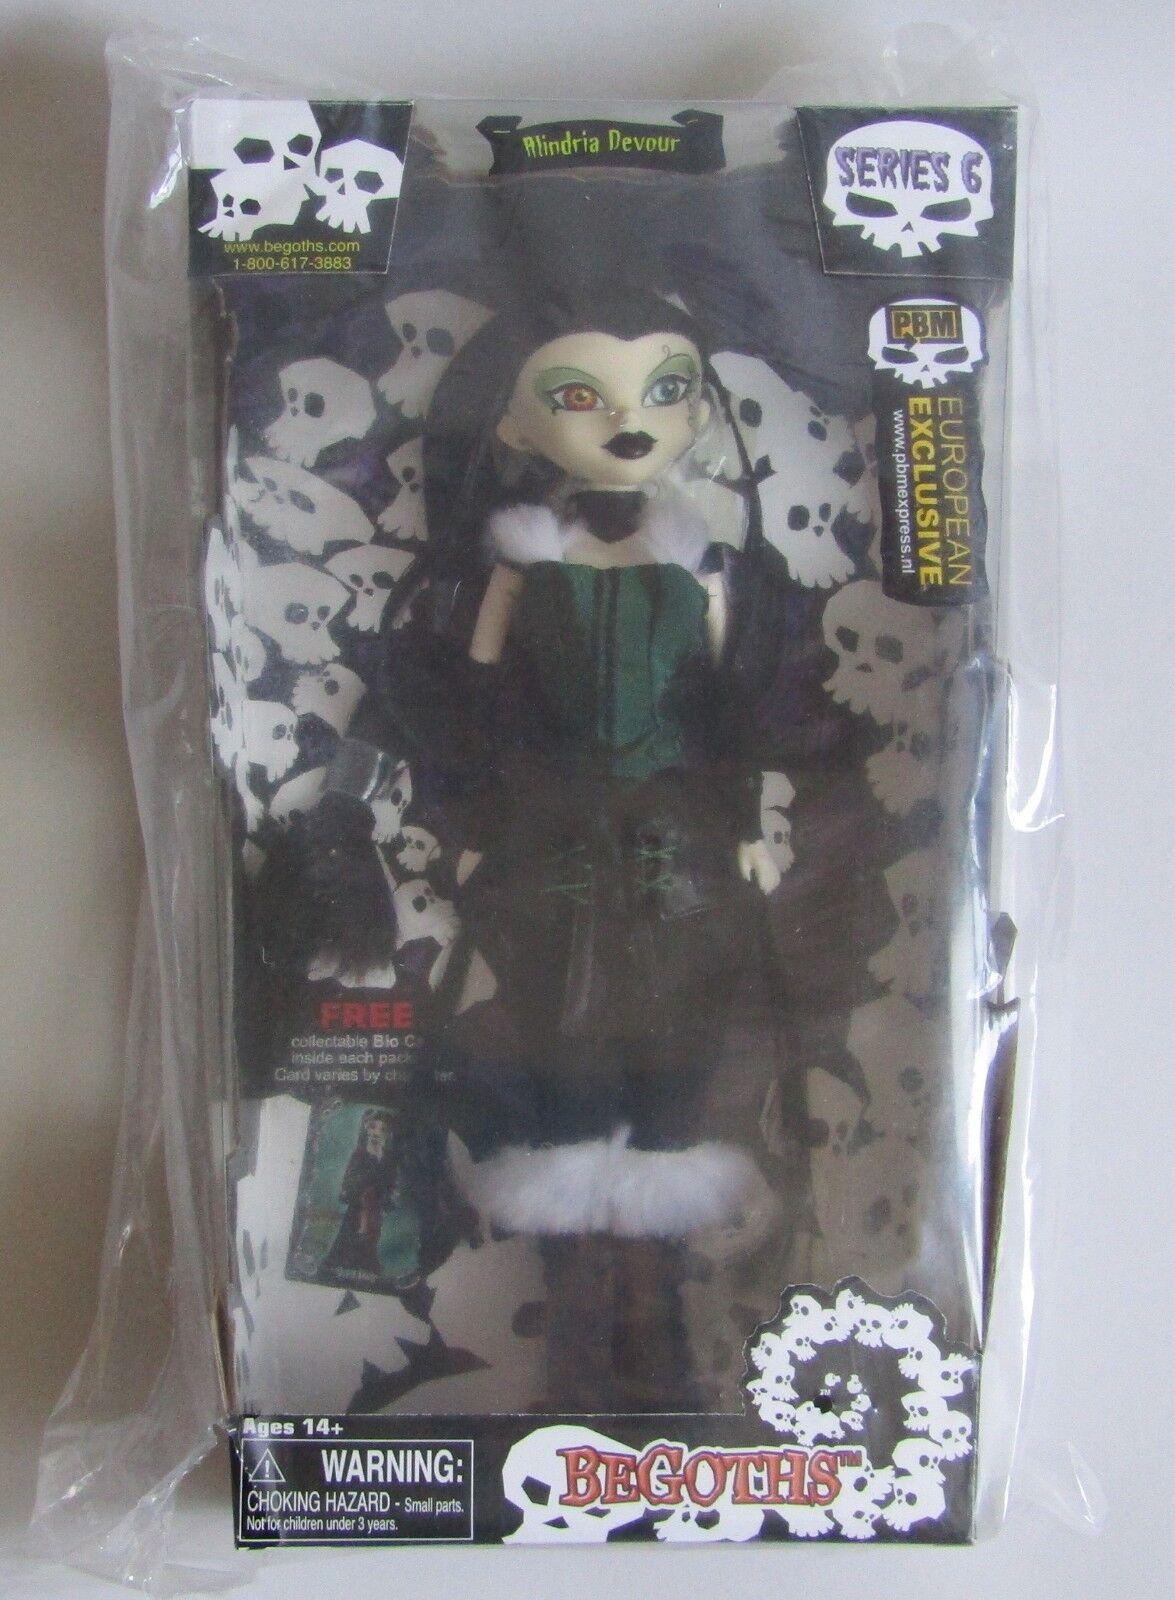 Begoths. bambola Alindria Devour  Series 6, NEUF, Scellé  benvenuto a scegliere